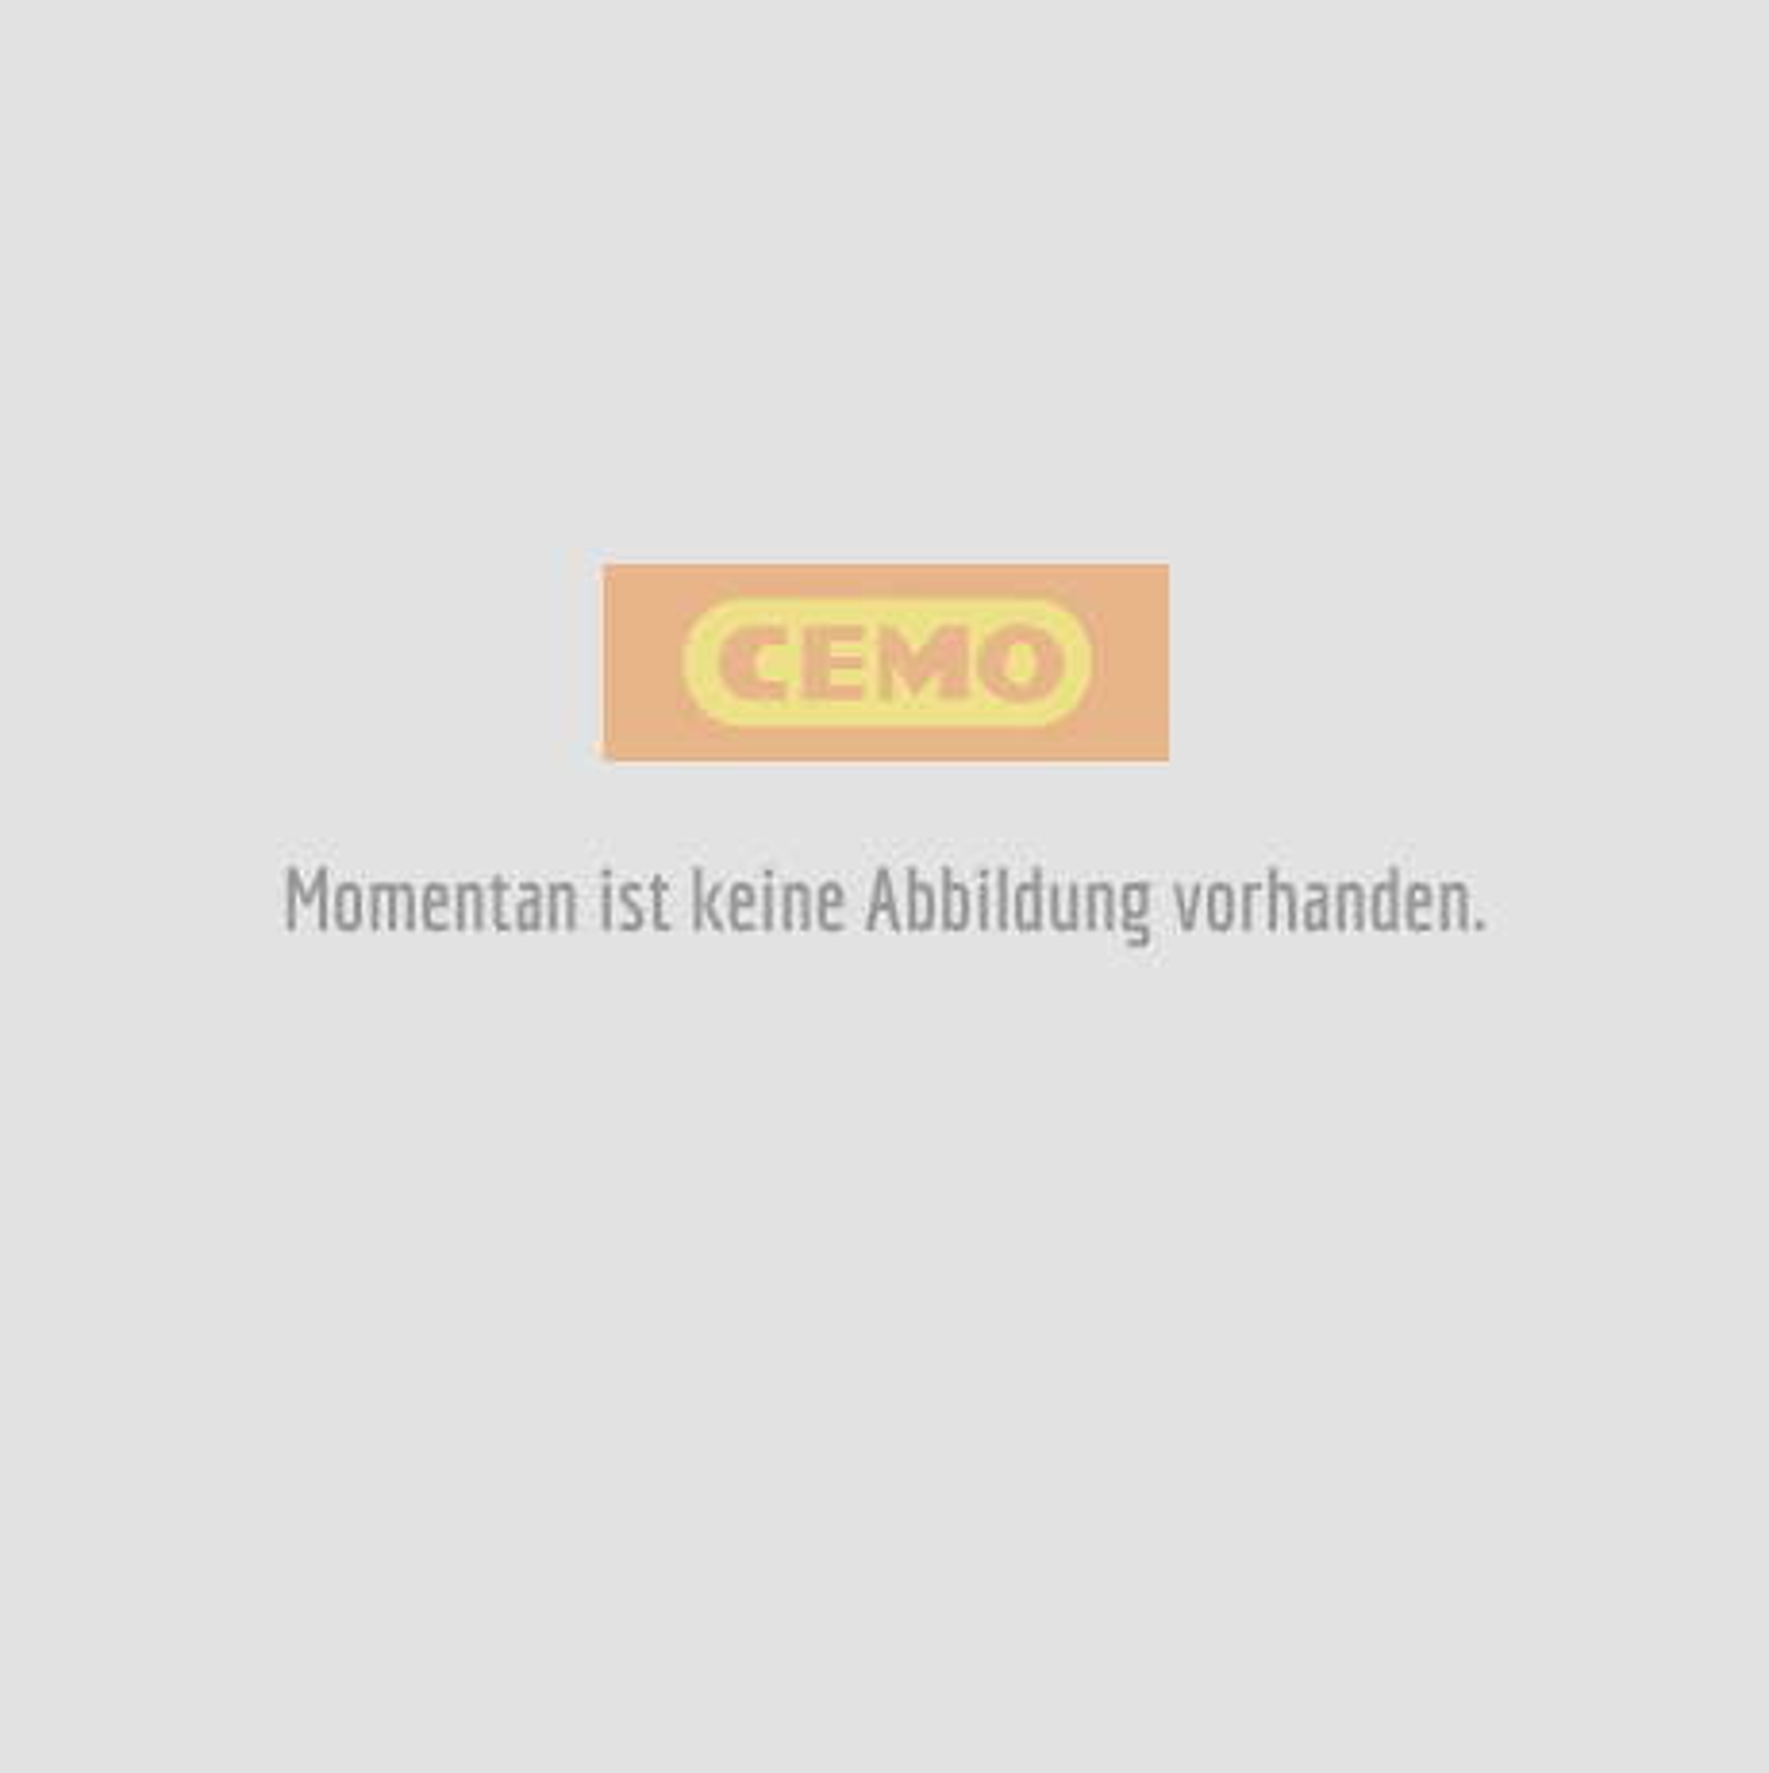 1 pcs. of user key, yellow